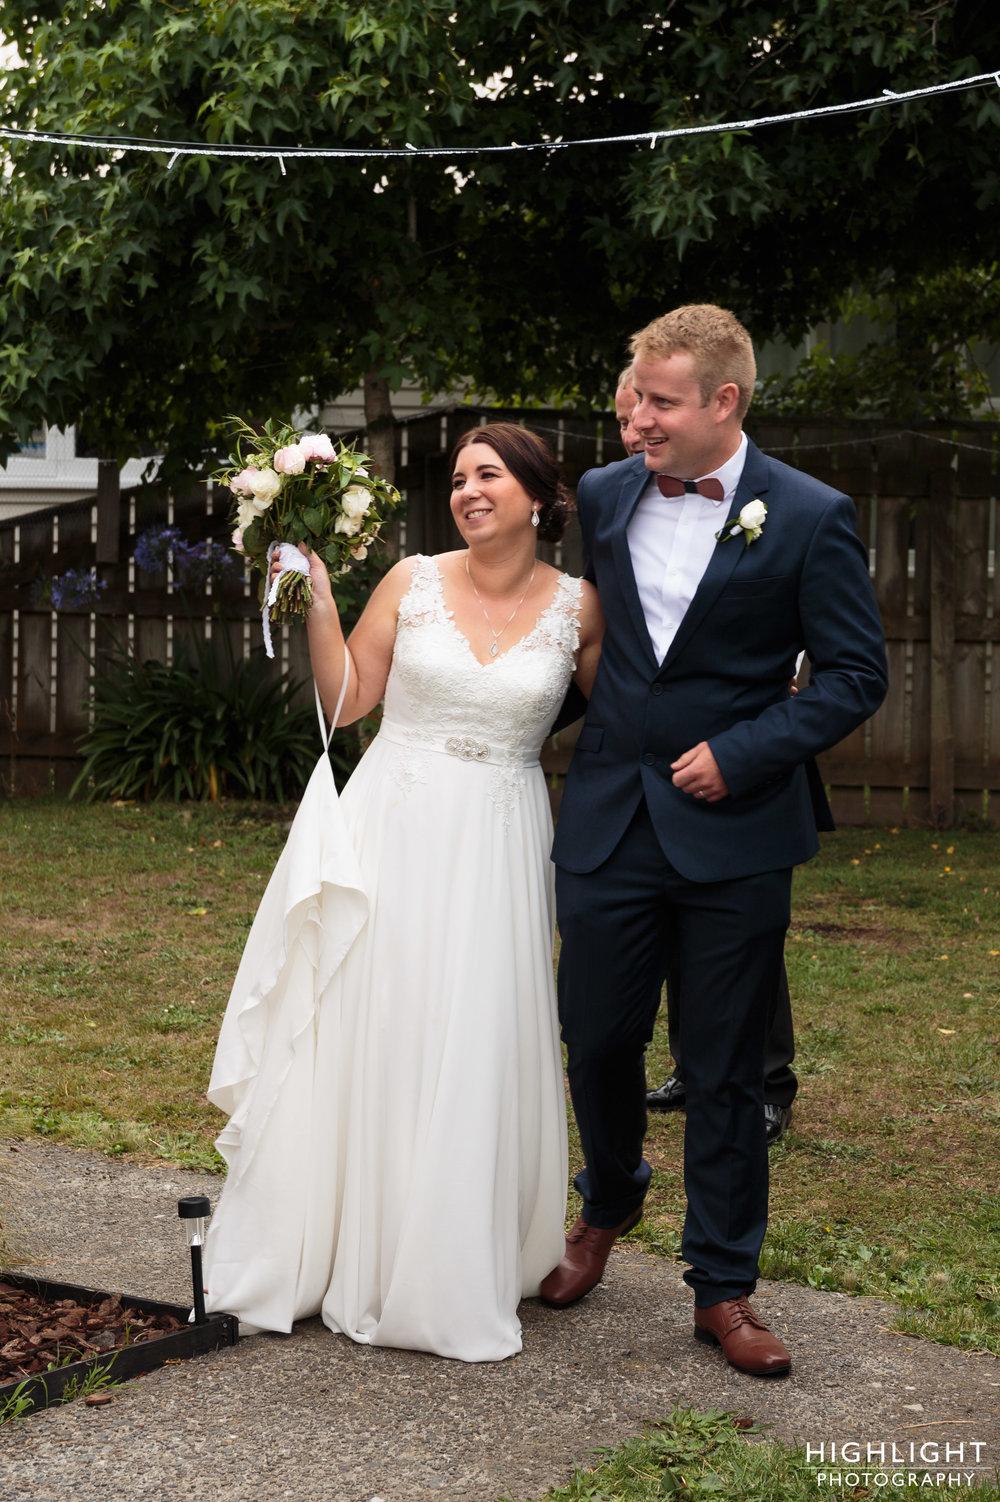 JM-2017-Highlight-wedding-photography-palmerston-north-new-zealand-151.jpg